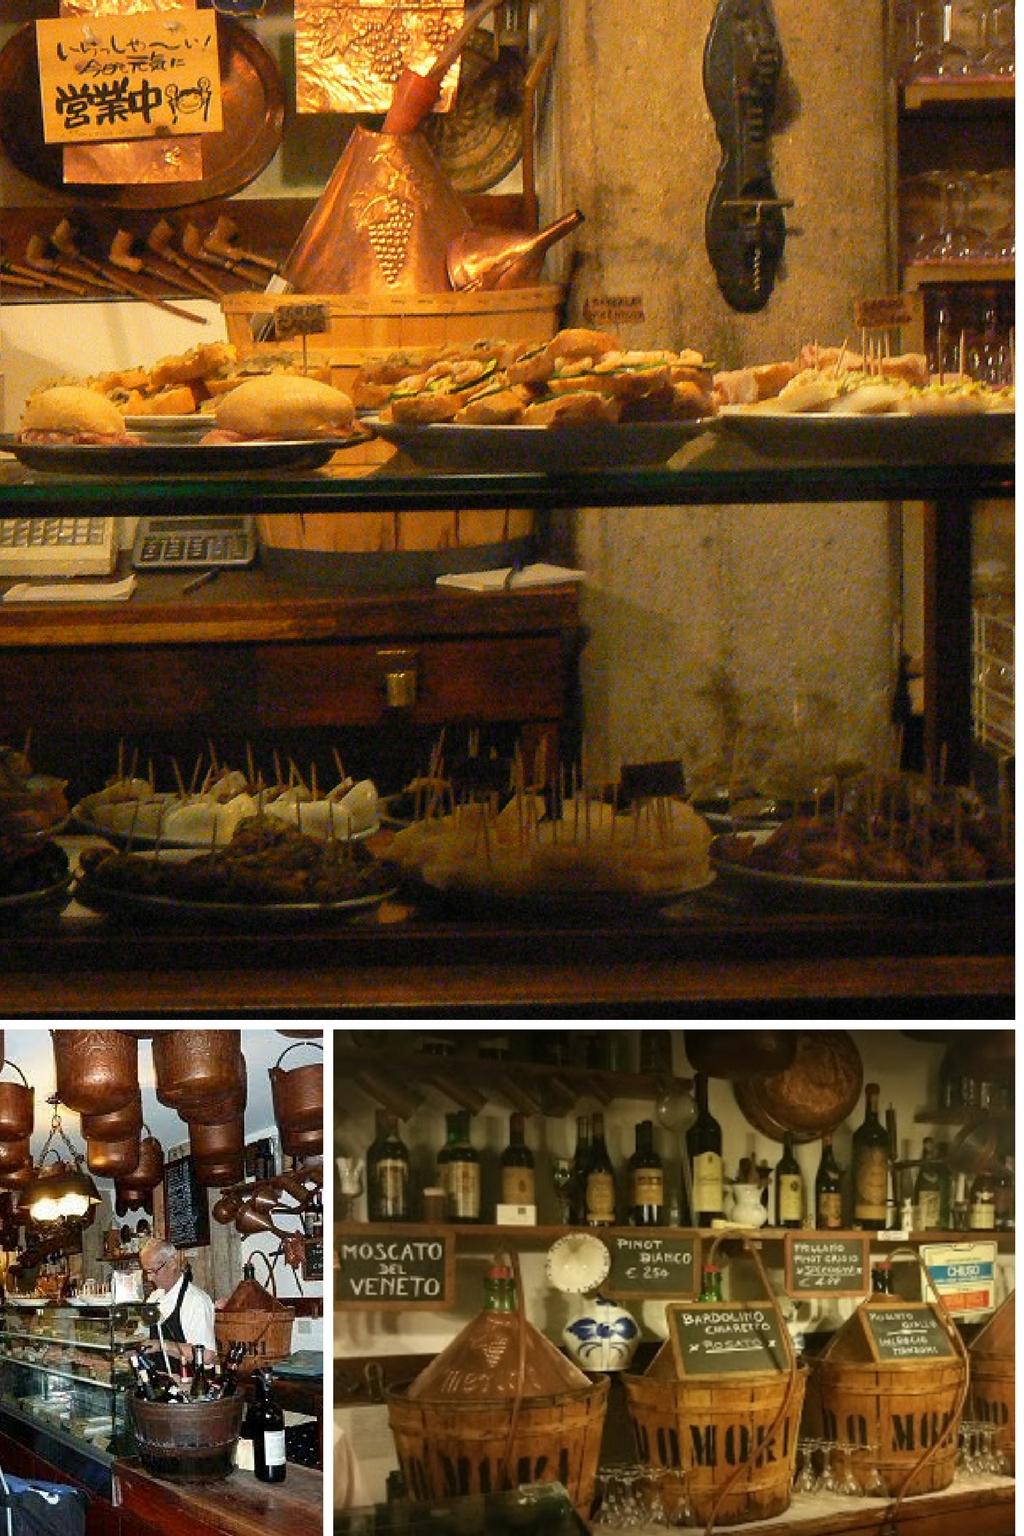 cantina-do-mori-bacari-venezia